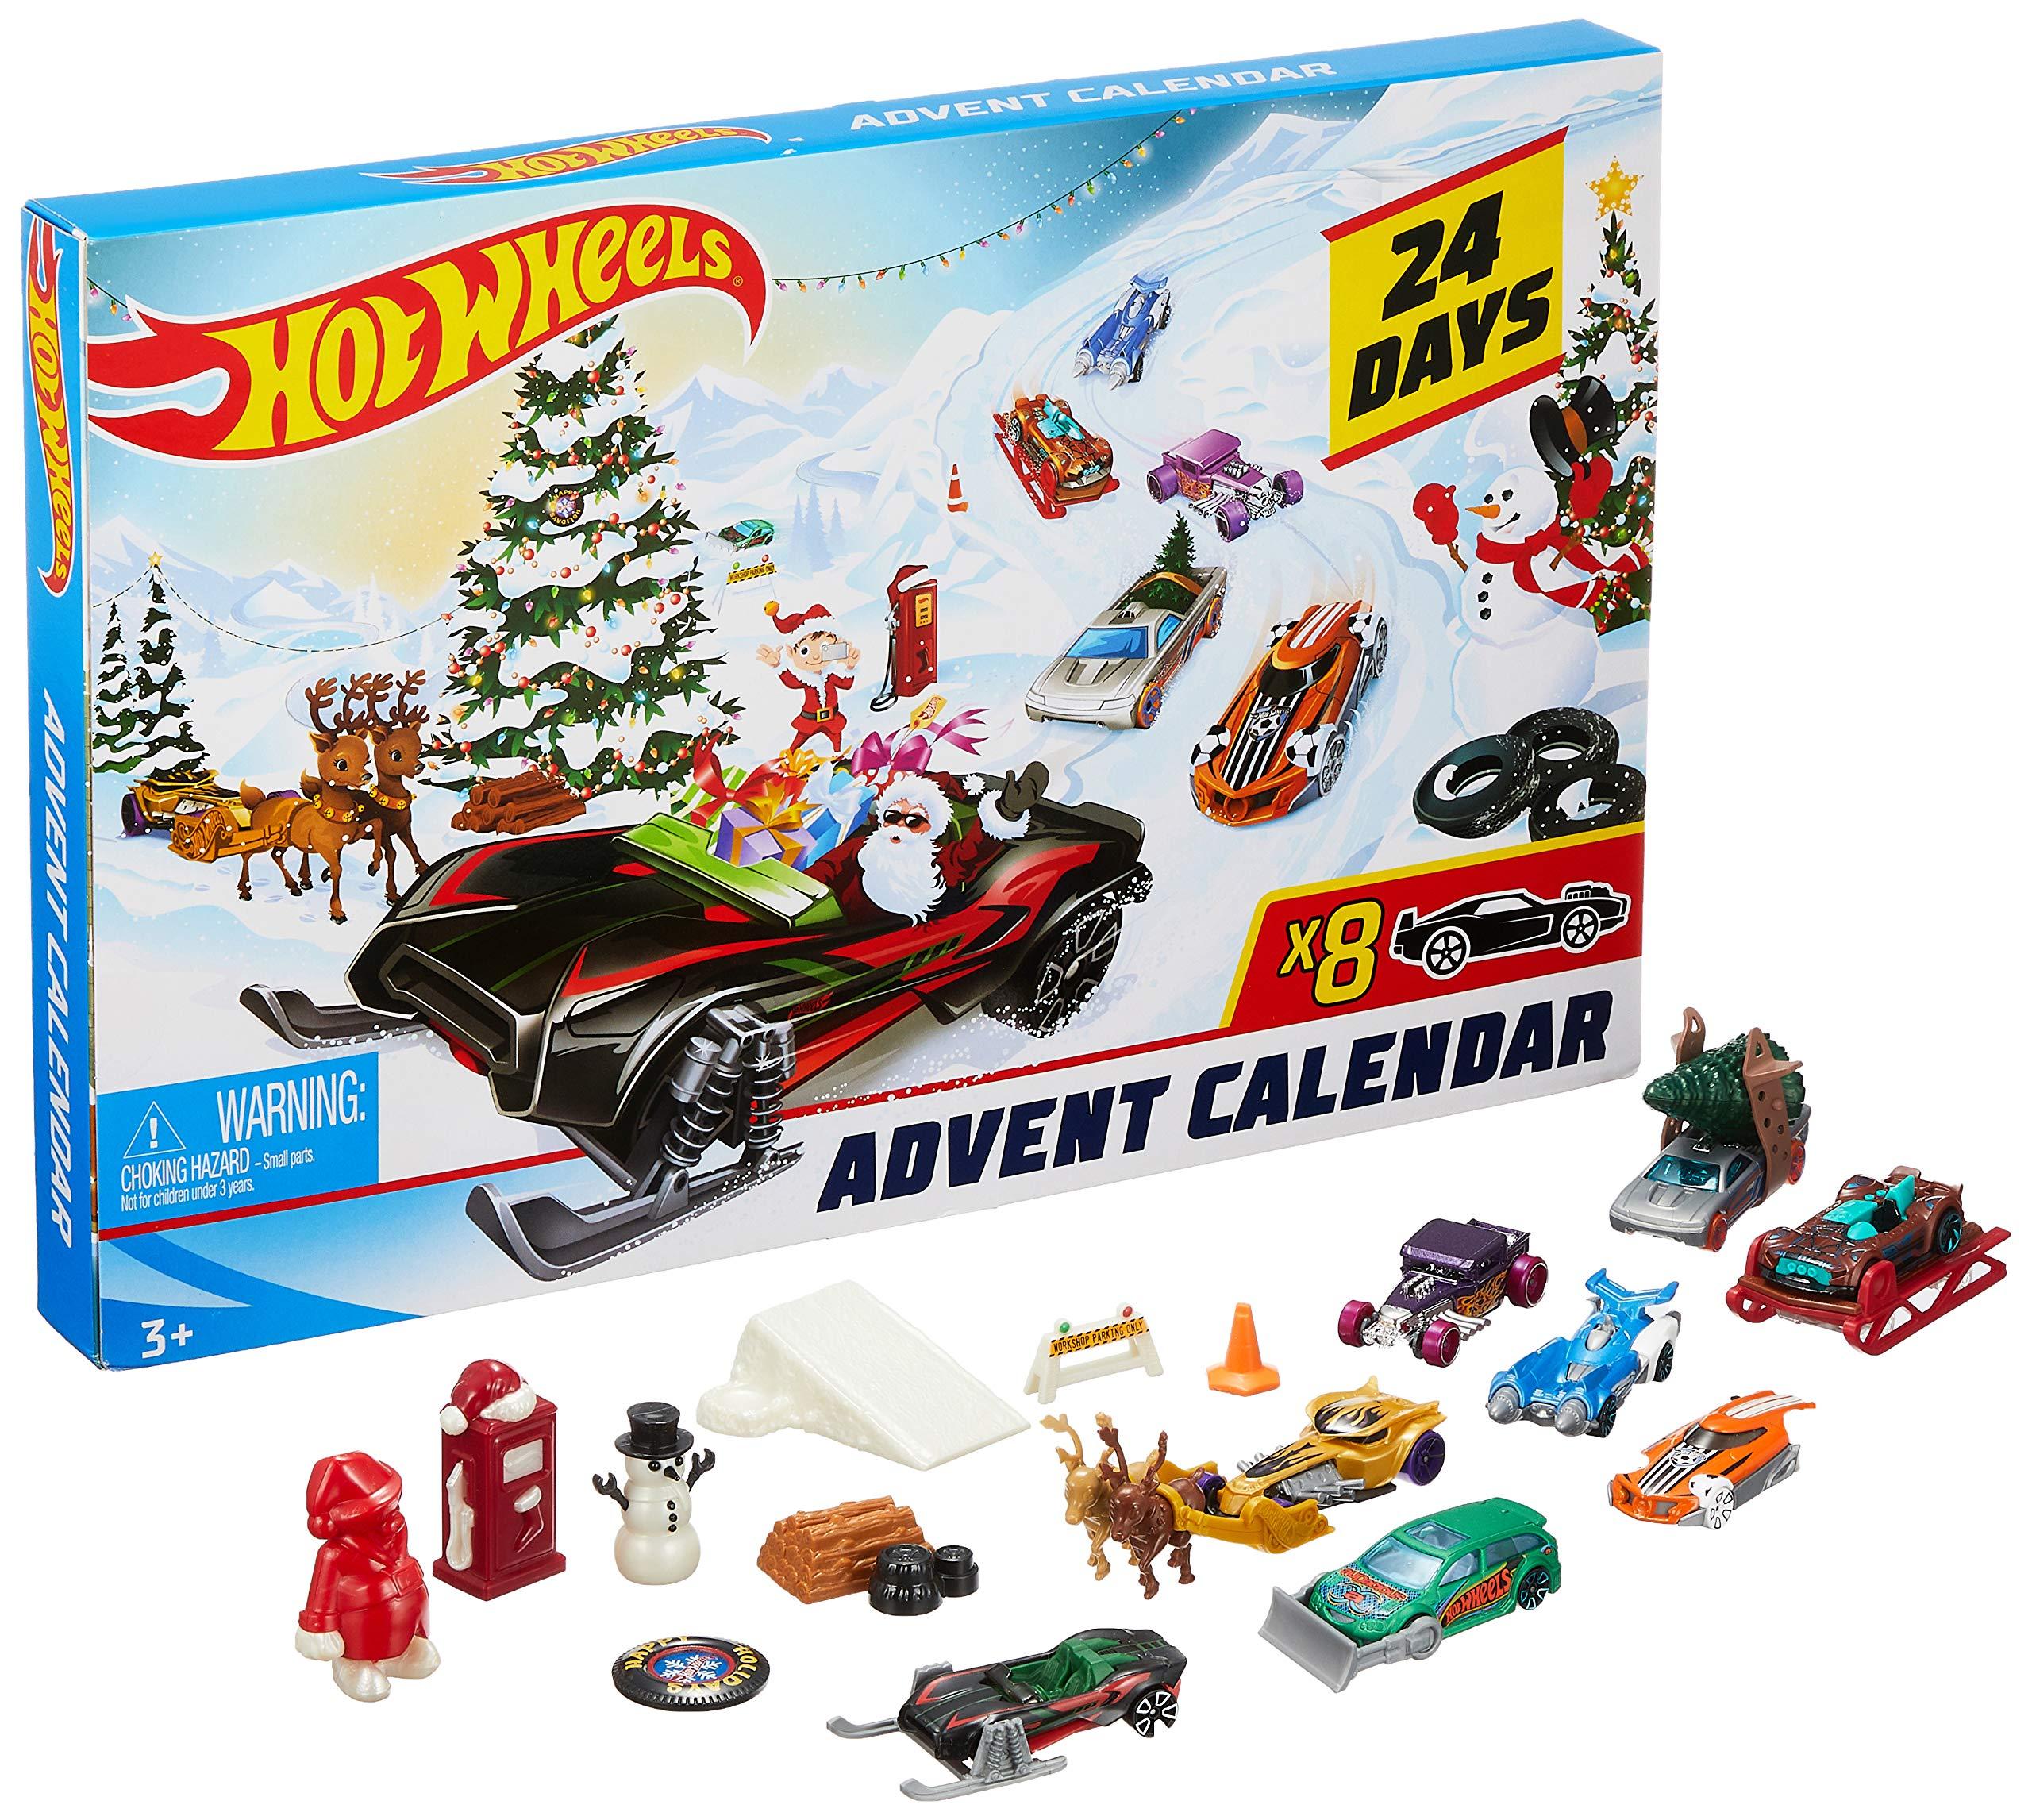 Lego Calendar May 2021 Amazon.com: Hot Wheels Advent Calendar Vehicles: Toys & Games